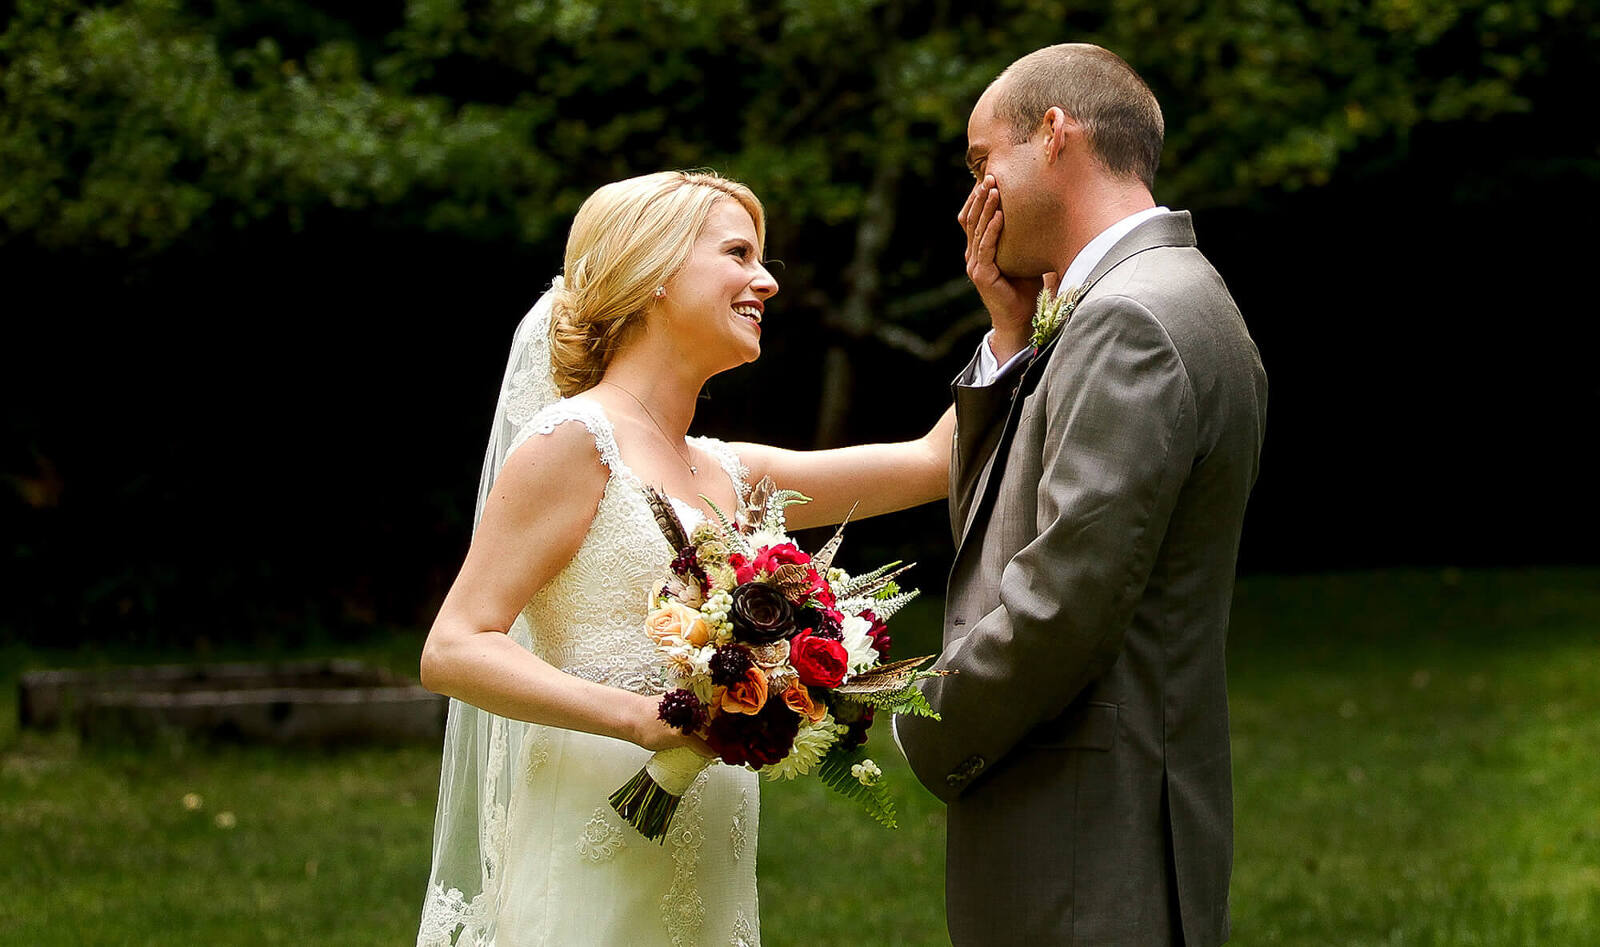 San Francisco wedding photographer - bride and groom outdoors